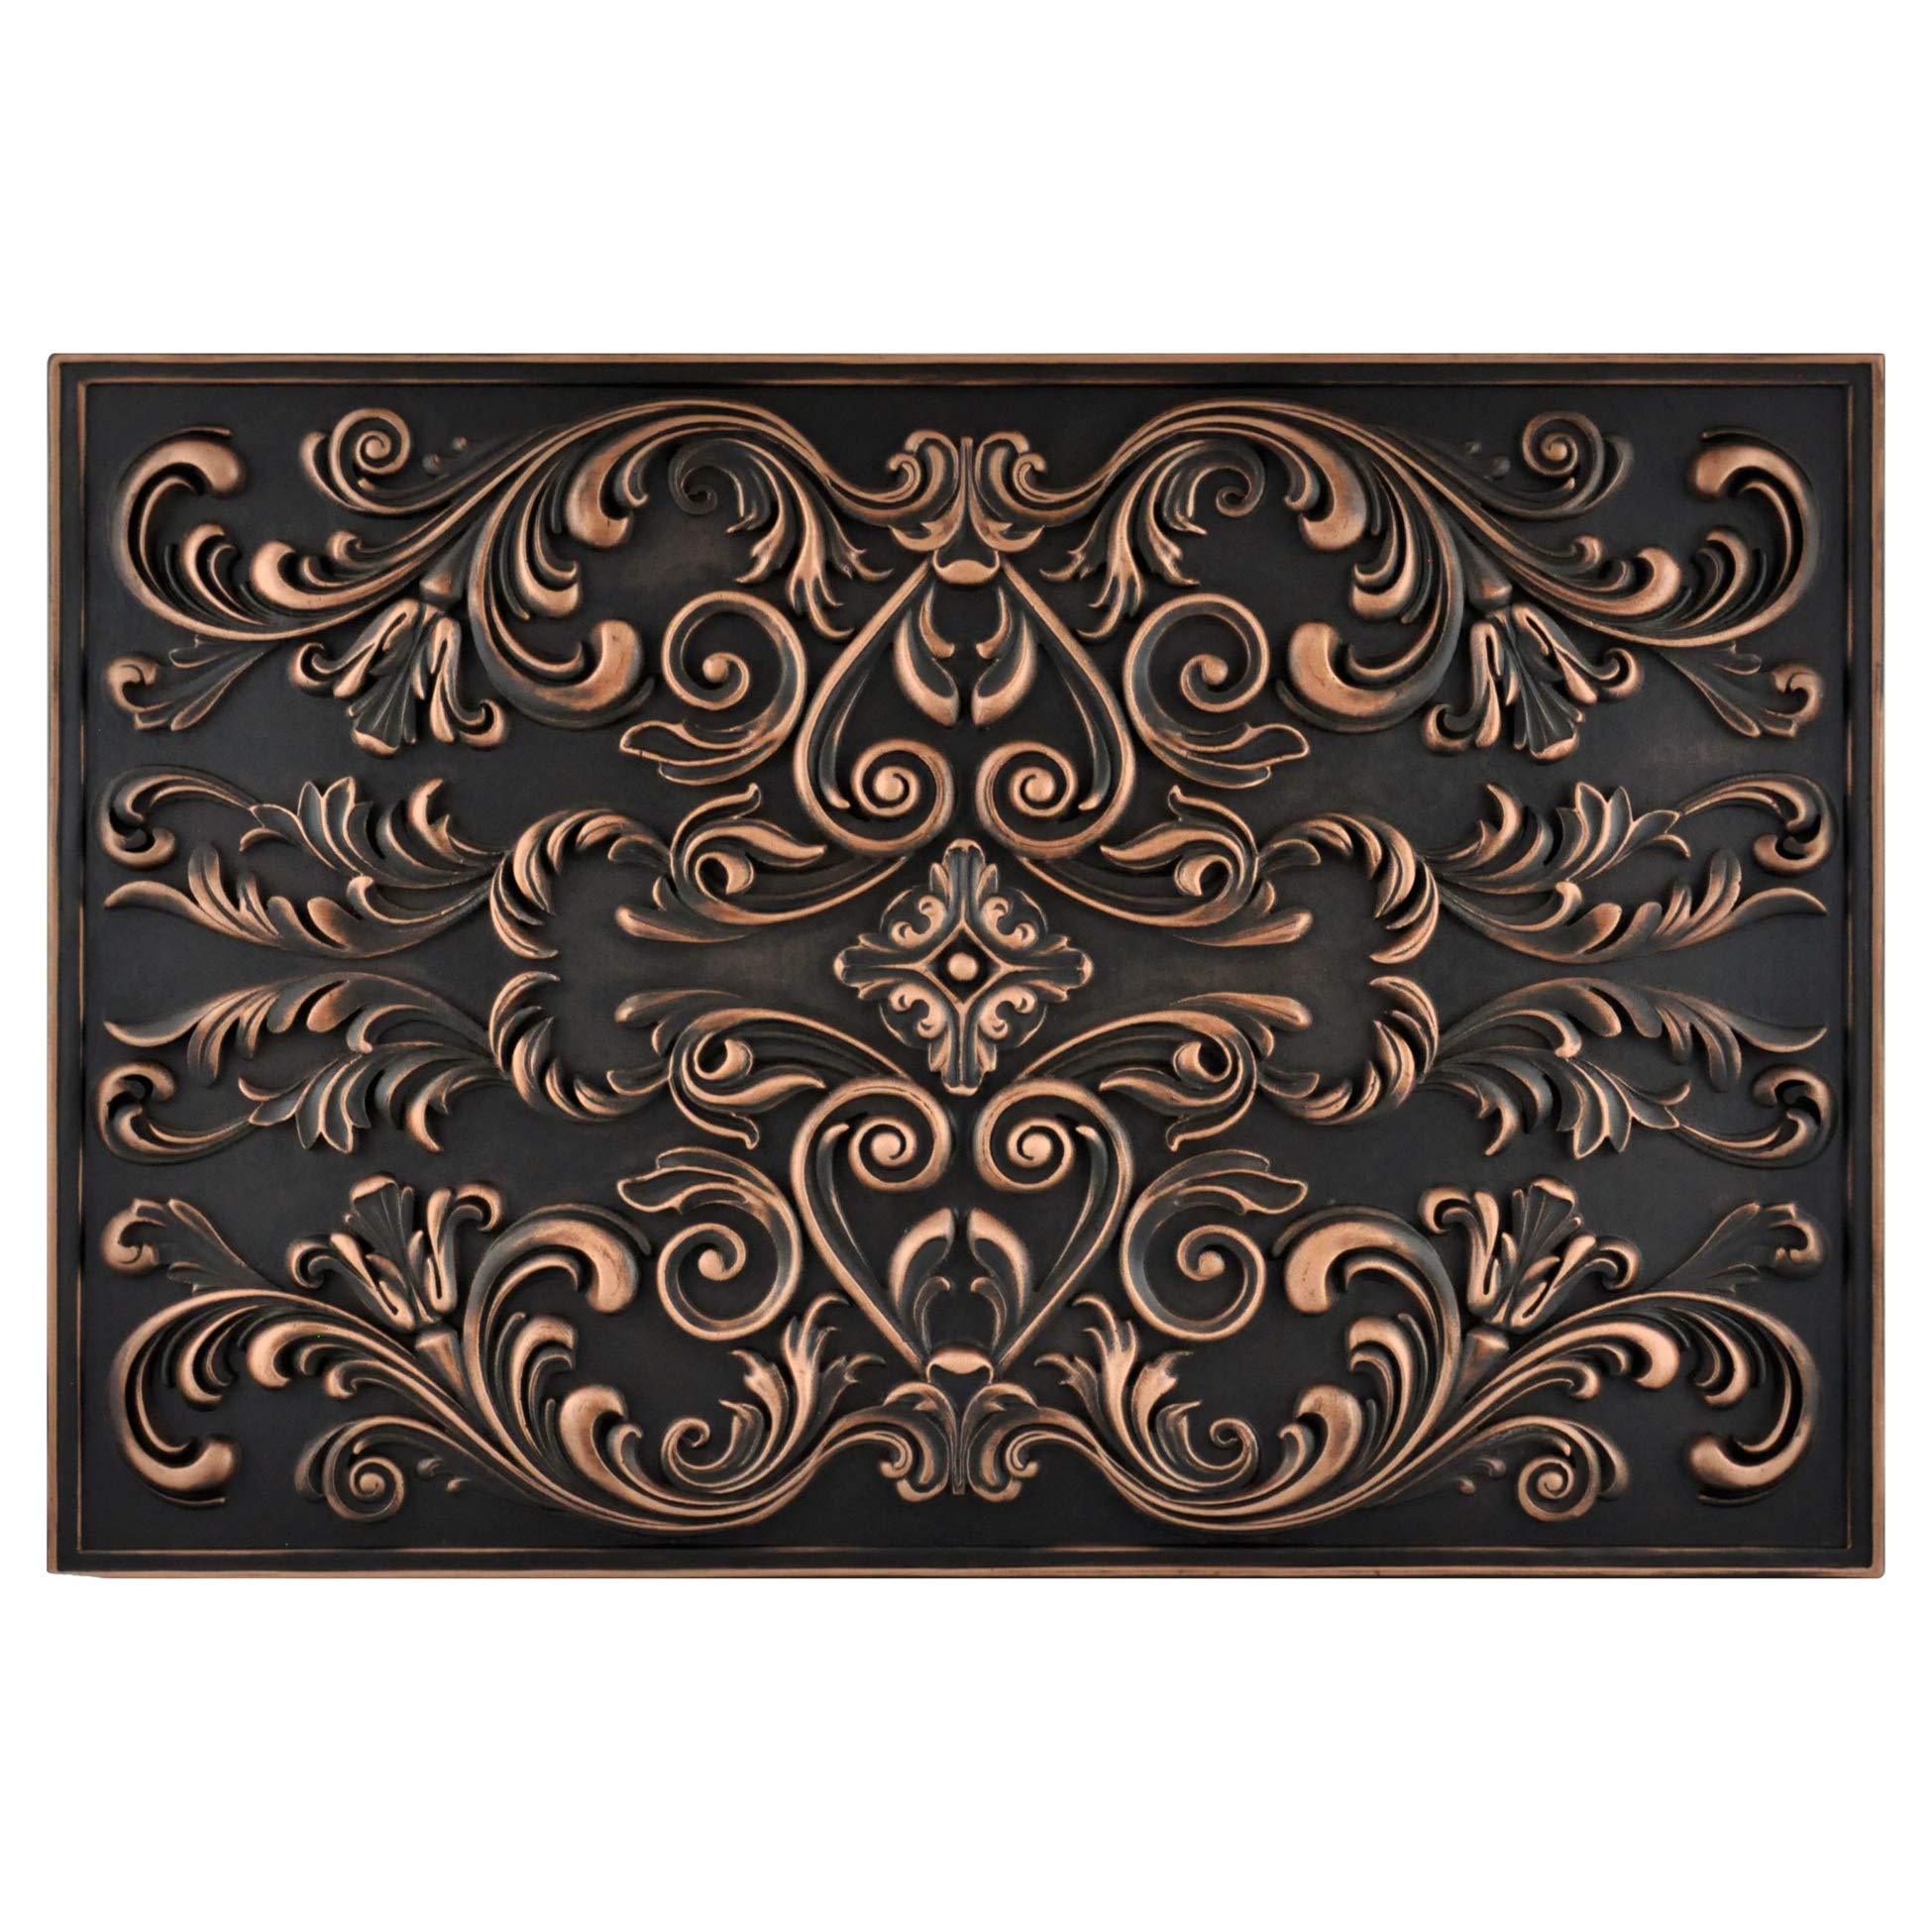 Vogue Tiles Kitchen Backsplash Premium Oil Rubbed Bronze Metal Resin Mural Medallion Hand Made Textured Tile